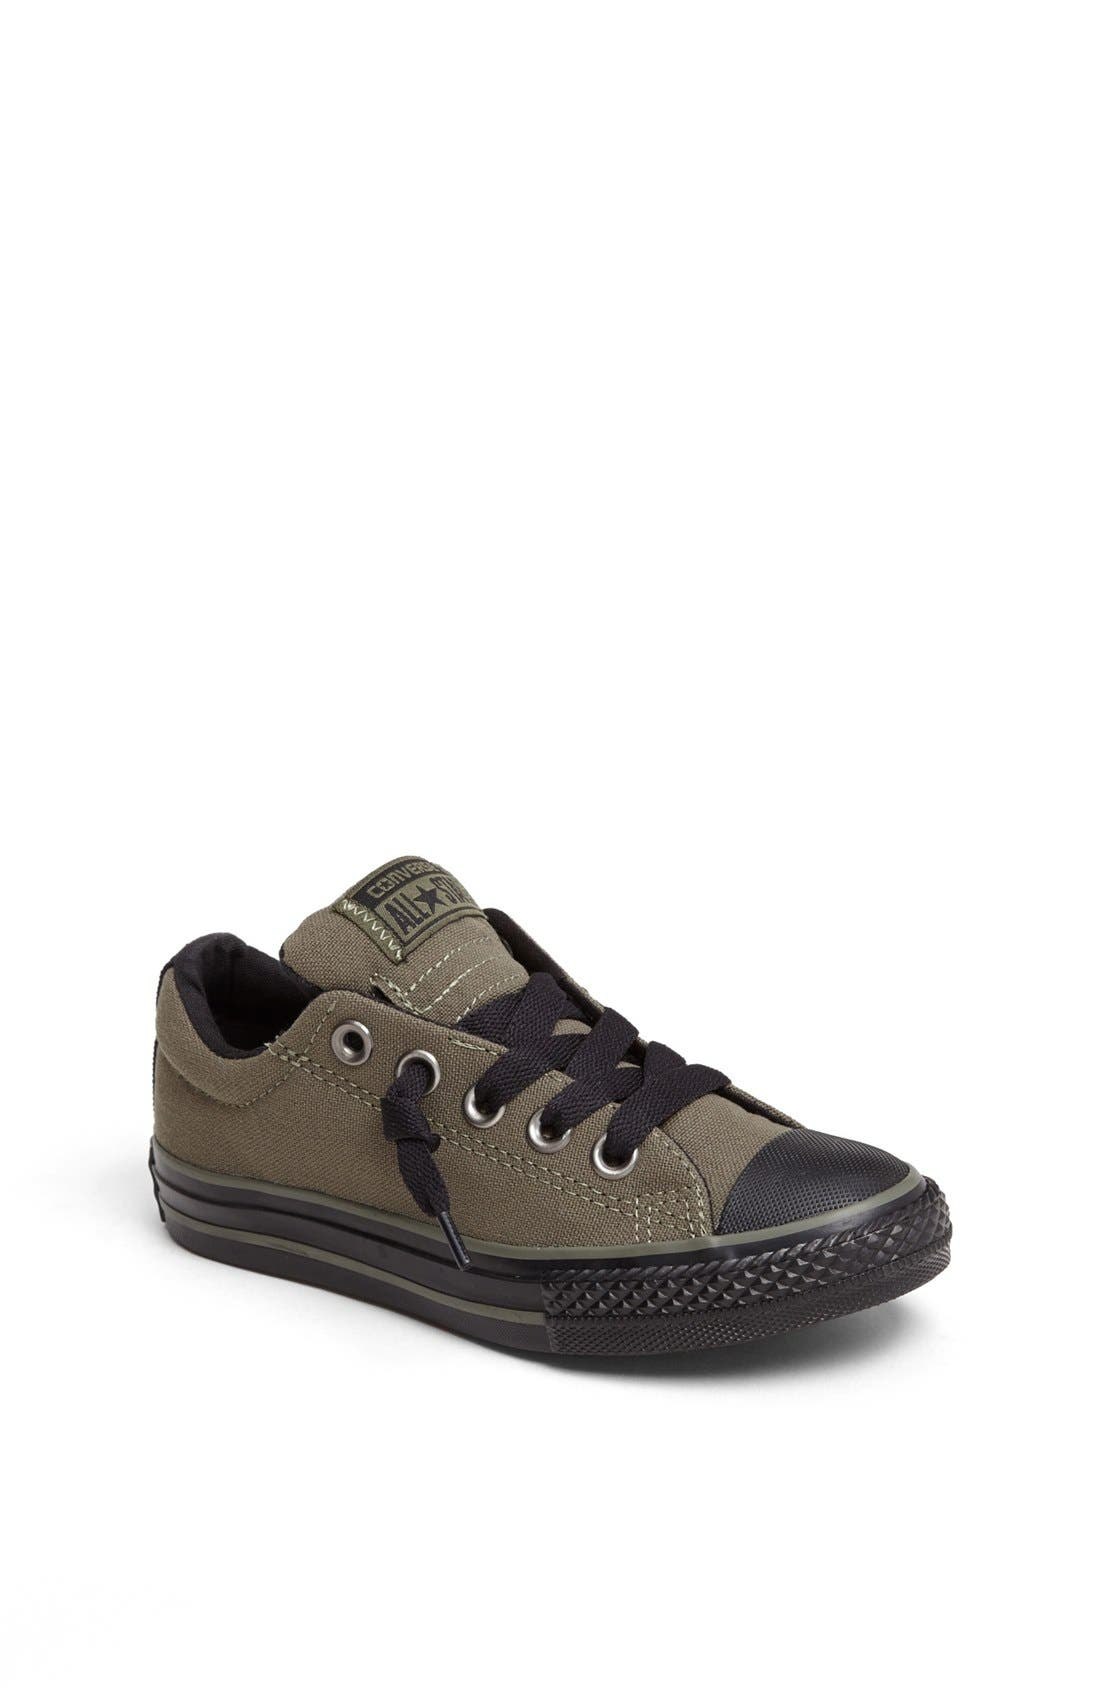 Main Image - Converse Chuck Taylor® 'CT Street' Slip-On Sneaker (Toddler, Little Kid & Big Kid)